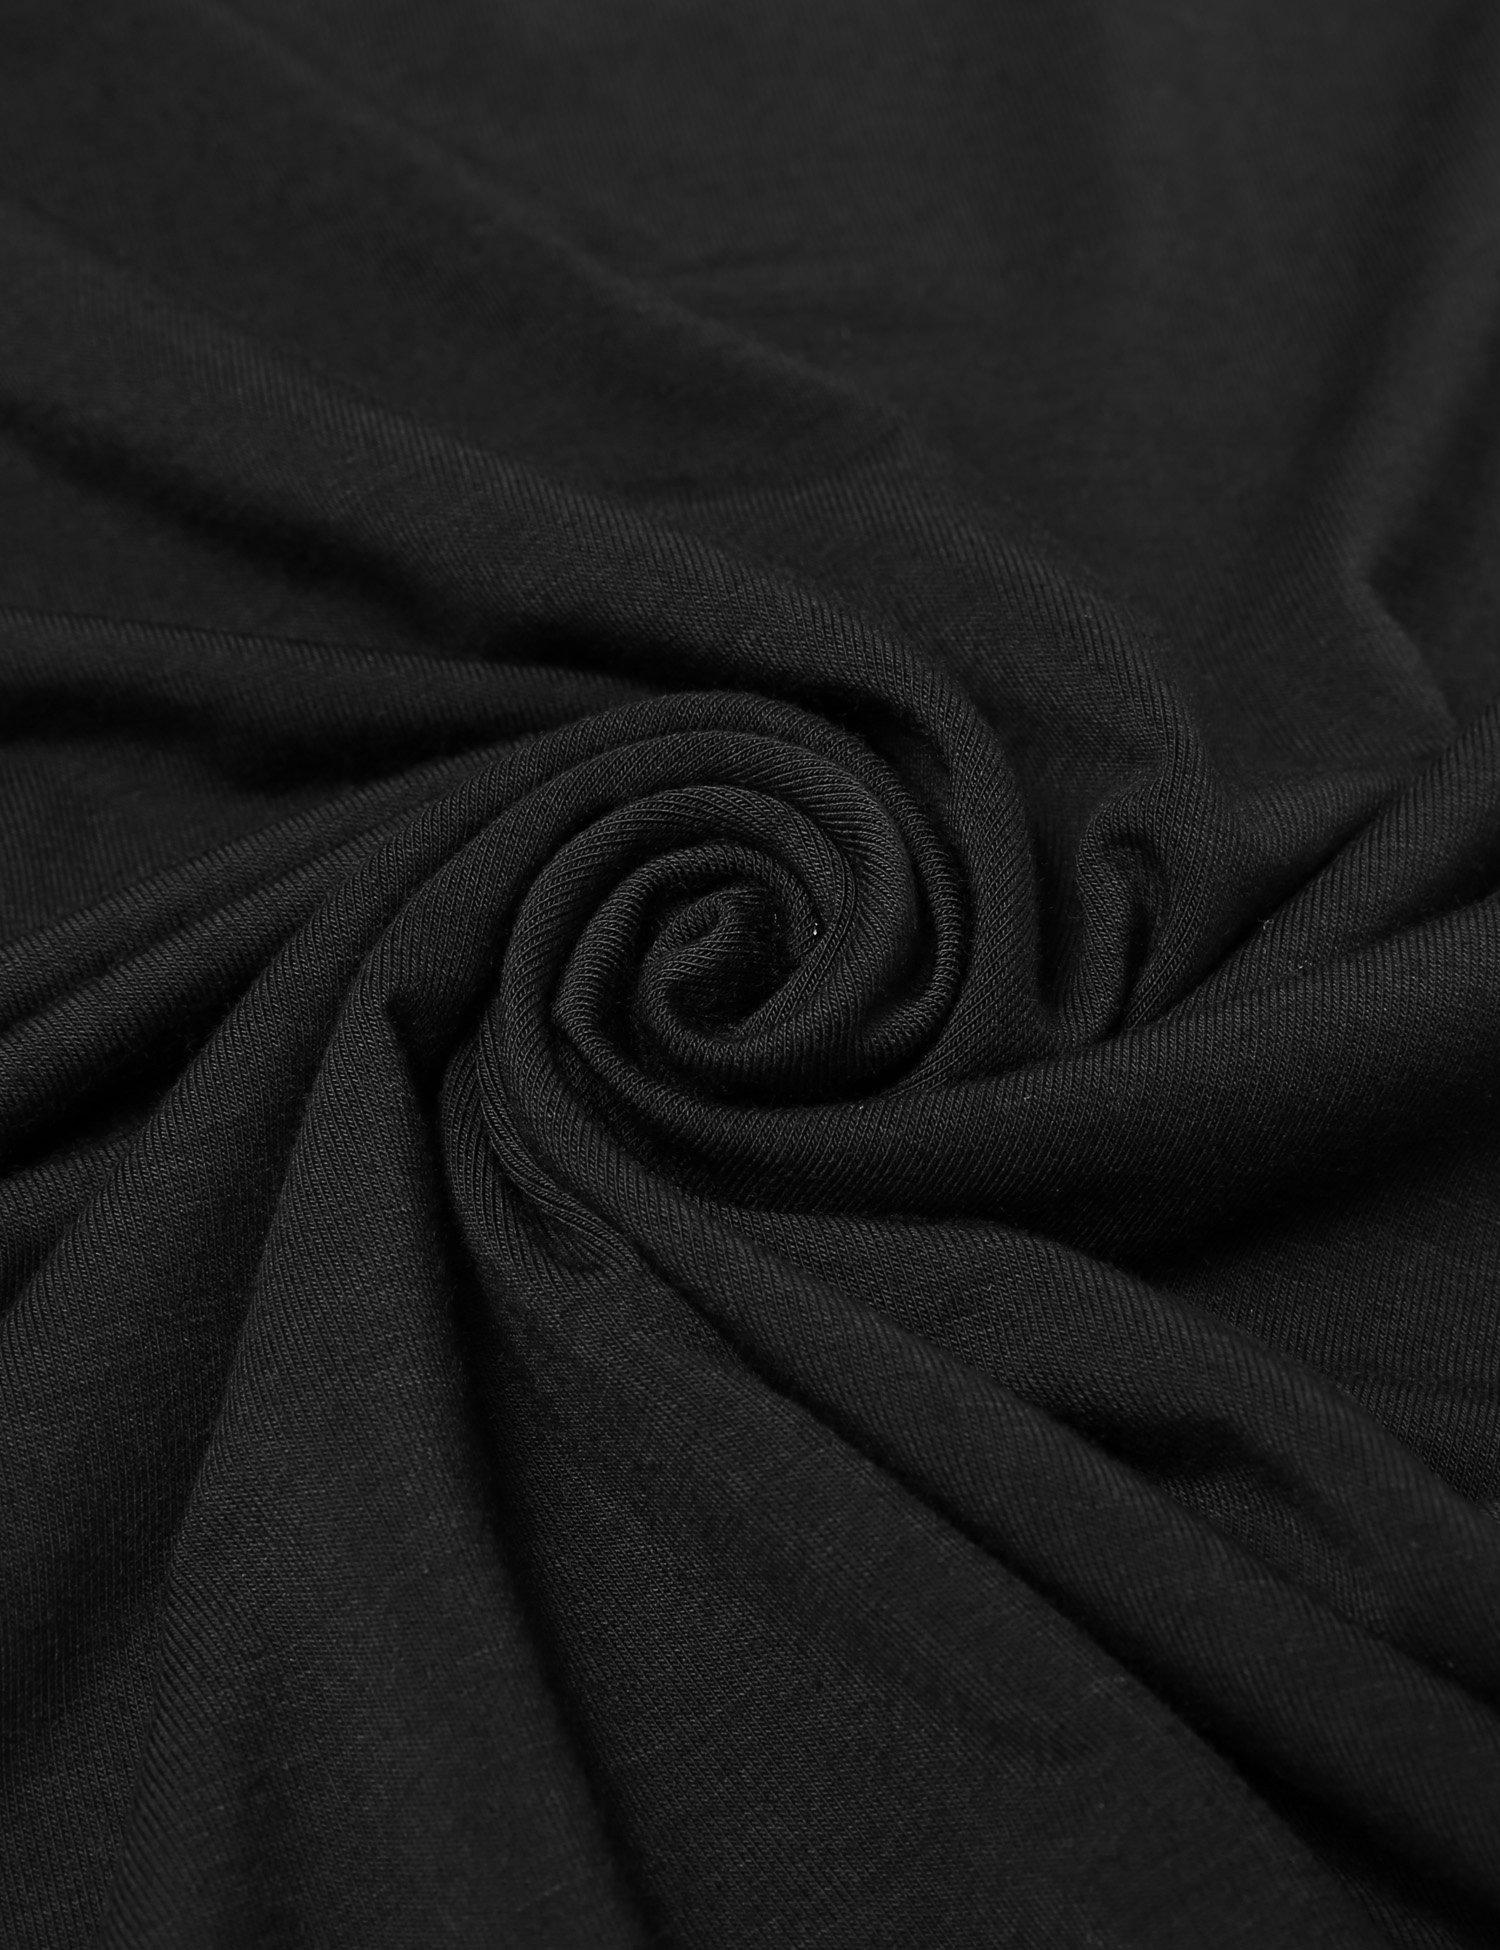 Ekouaer Women Thermal Underwear Set Solid V-Neck Long Sleeve Top and Long Pants Bottom Sleepwear by Ekouaer (Image #8)